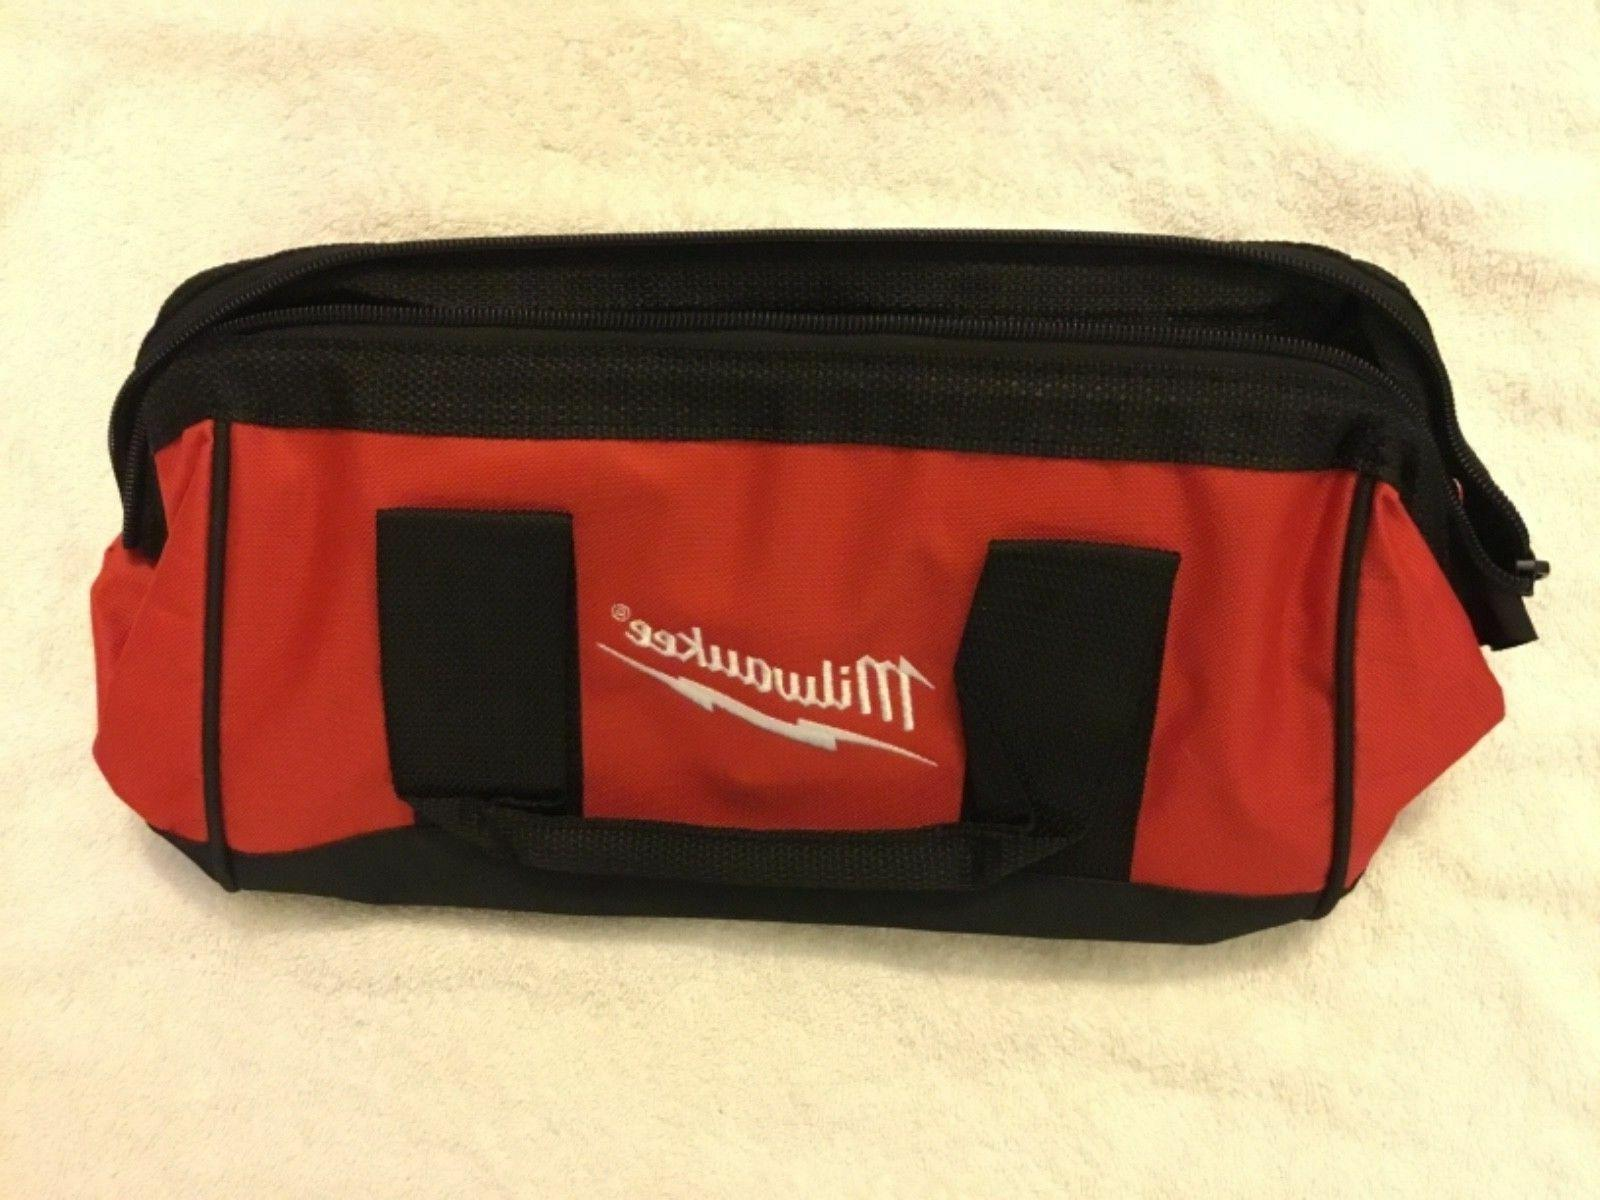 New Milwaukee x Heavy Duty Tool Bag